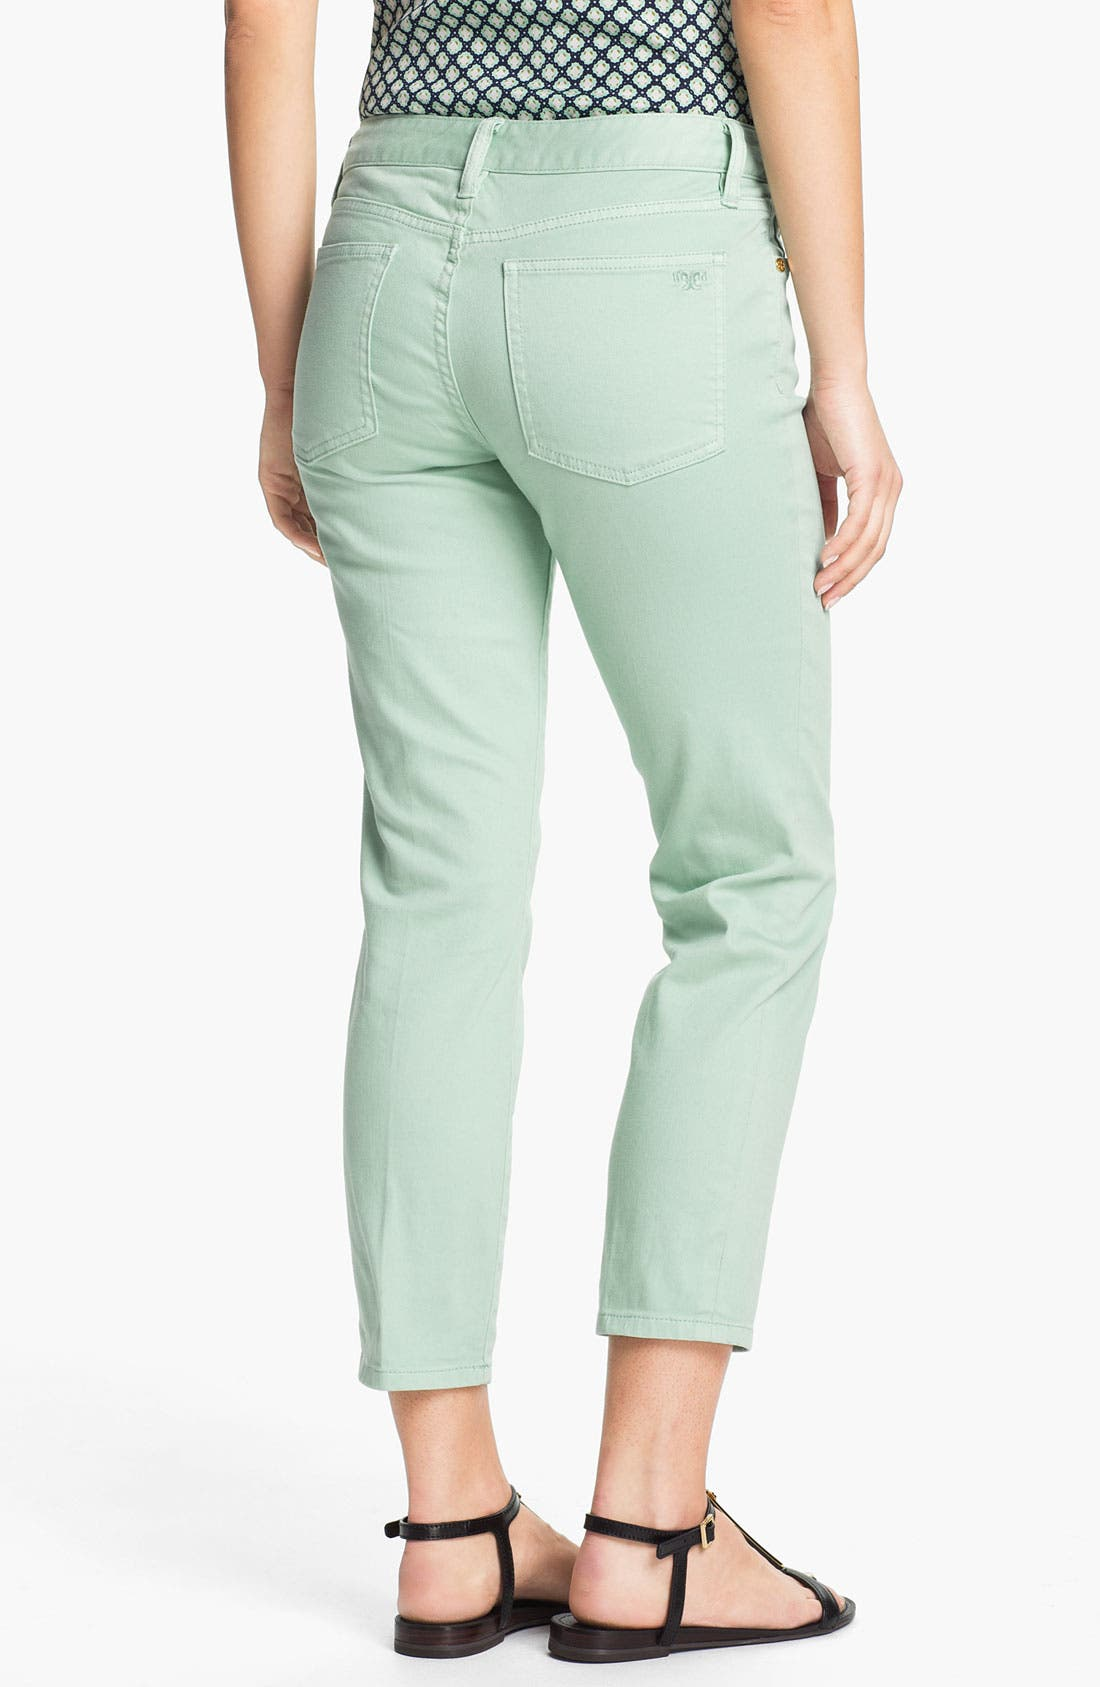 Alternate Image 2  - Tory Burch 'Alexa' Crop Skinny Stretch Jeans (Seaglass)